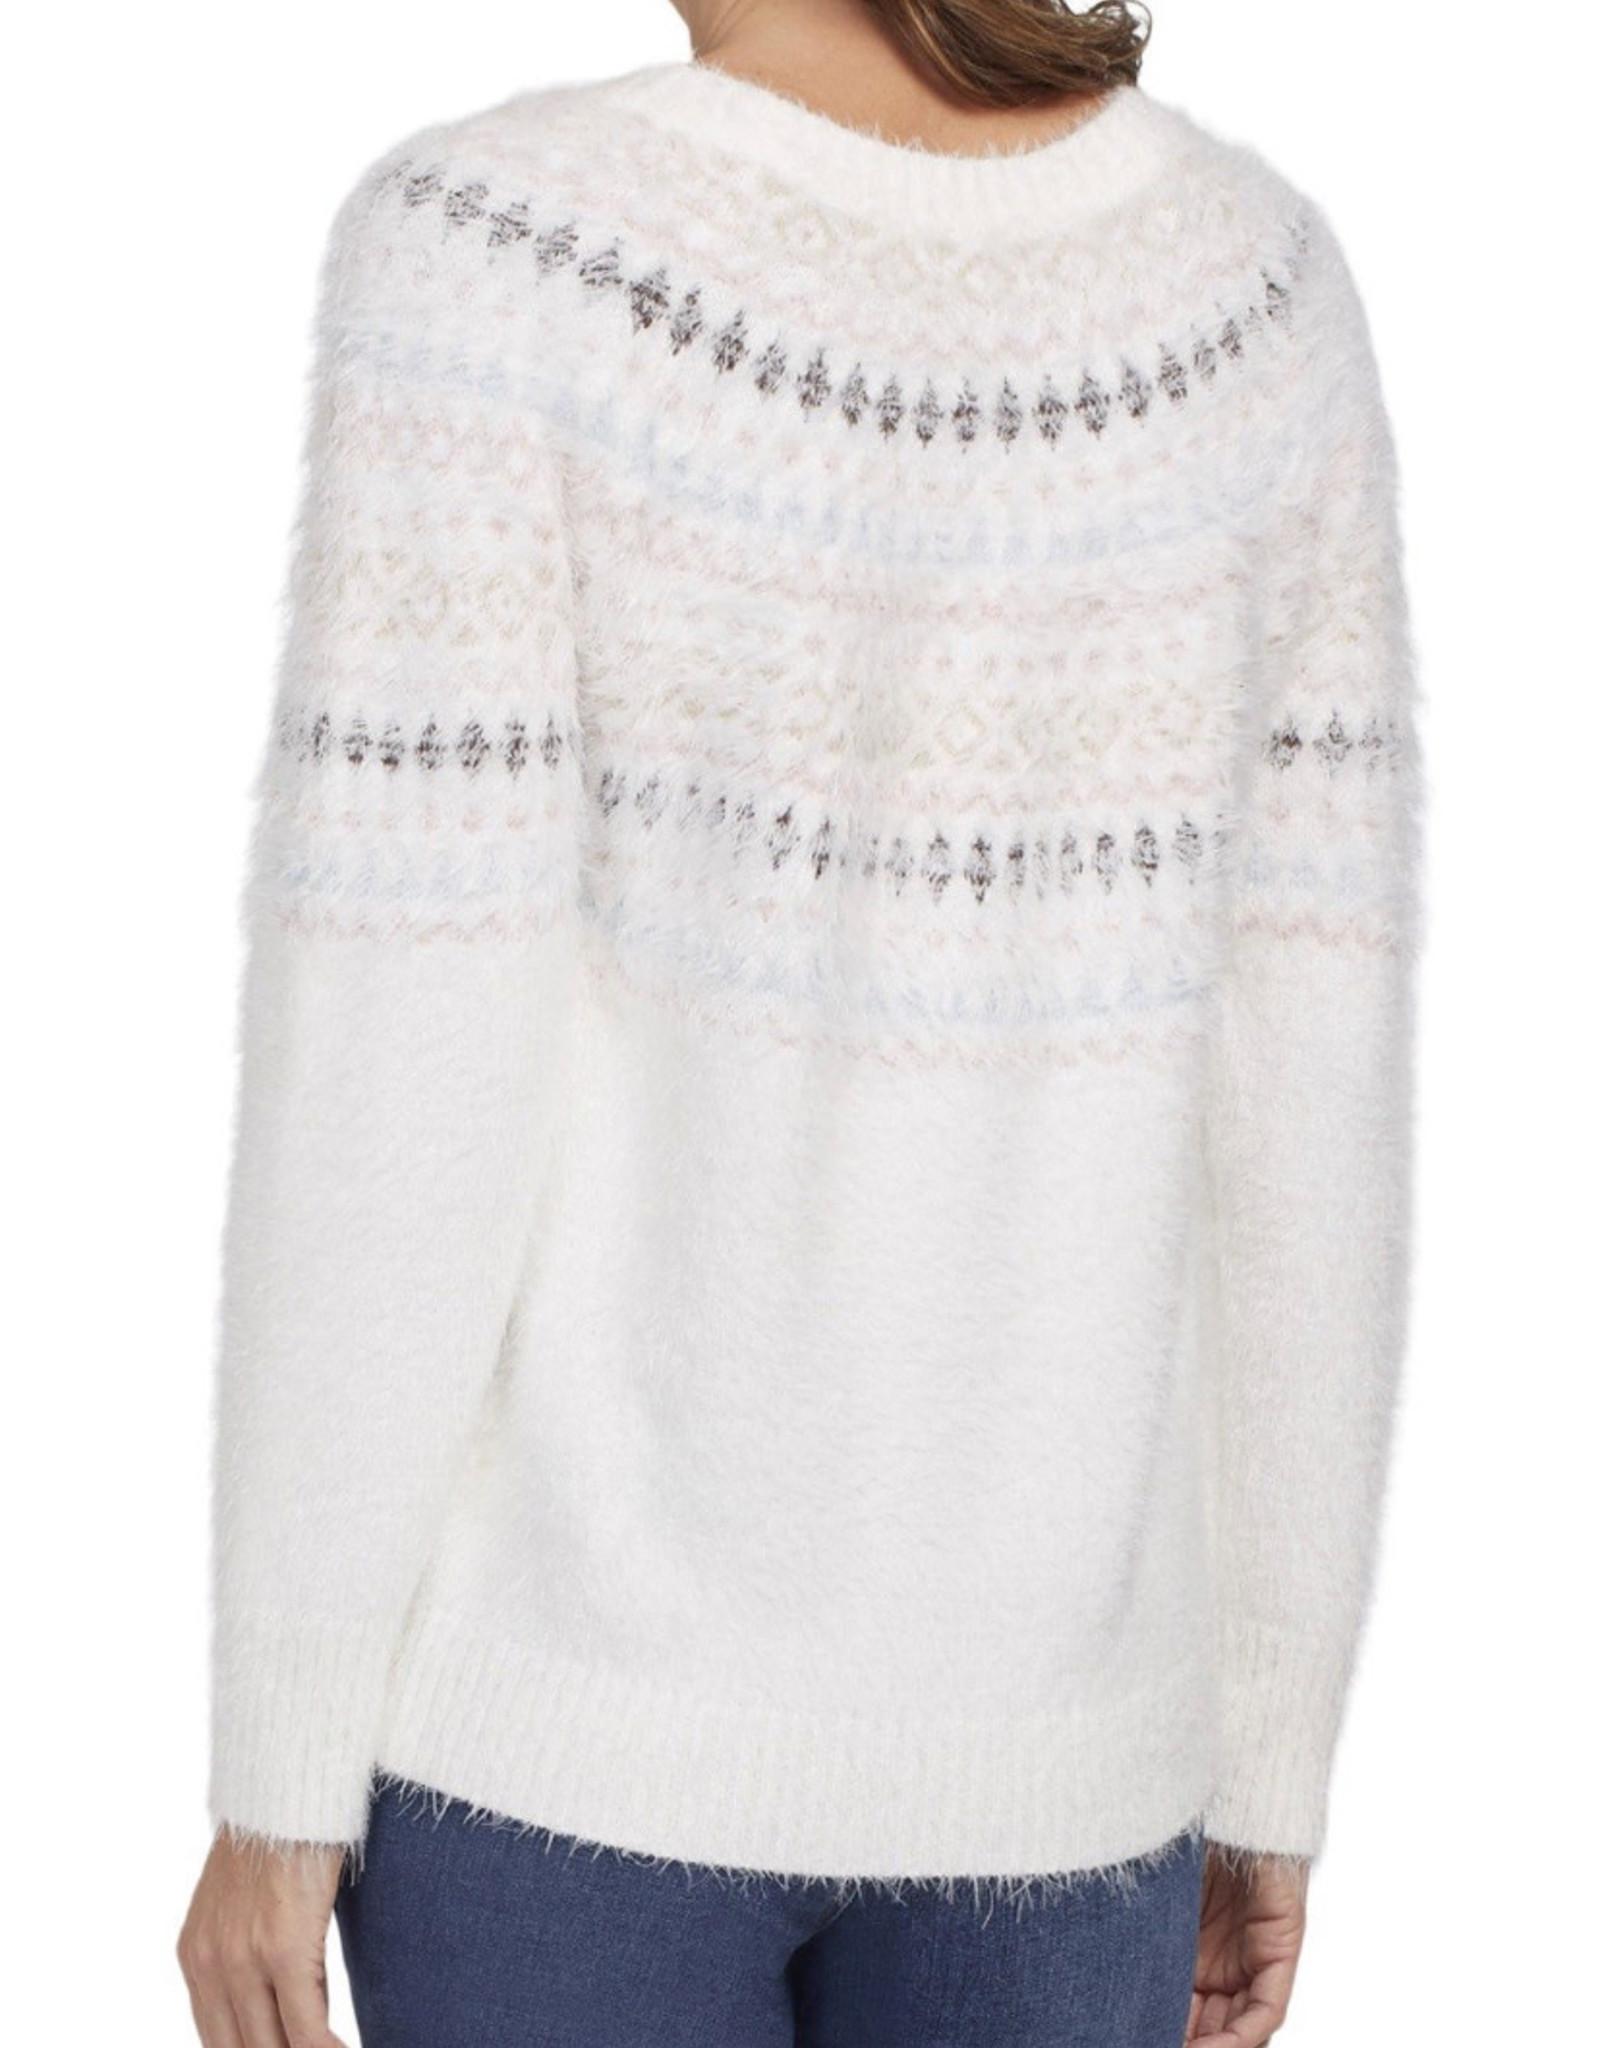 Fair Isle sweater Eggshell